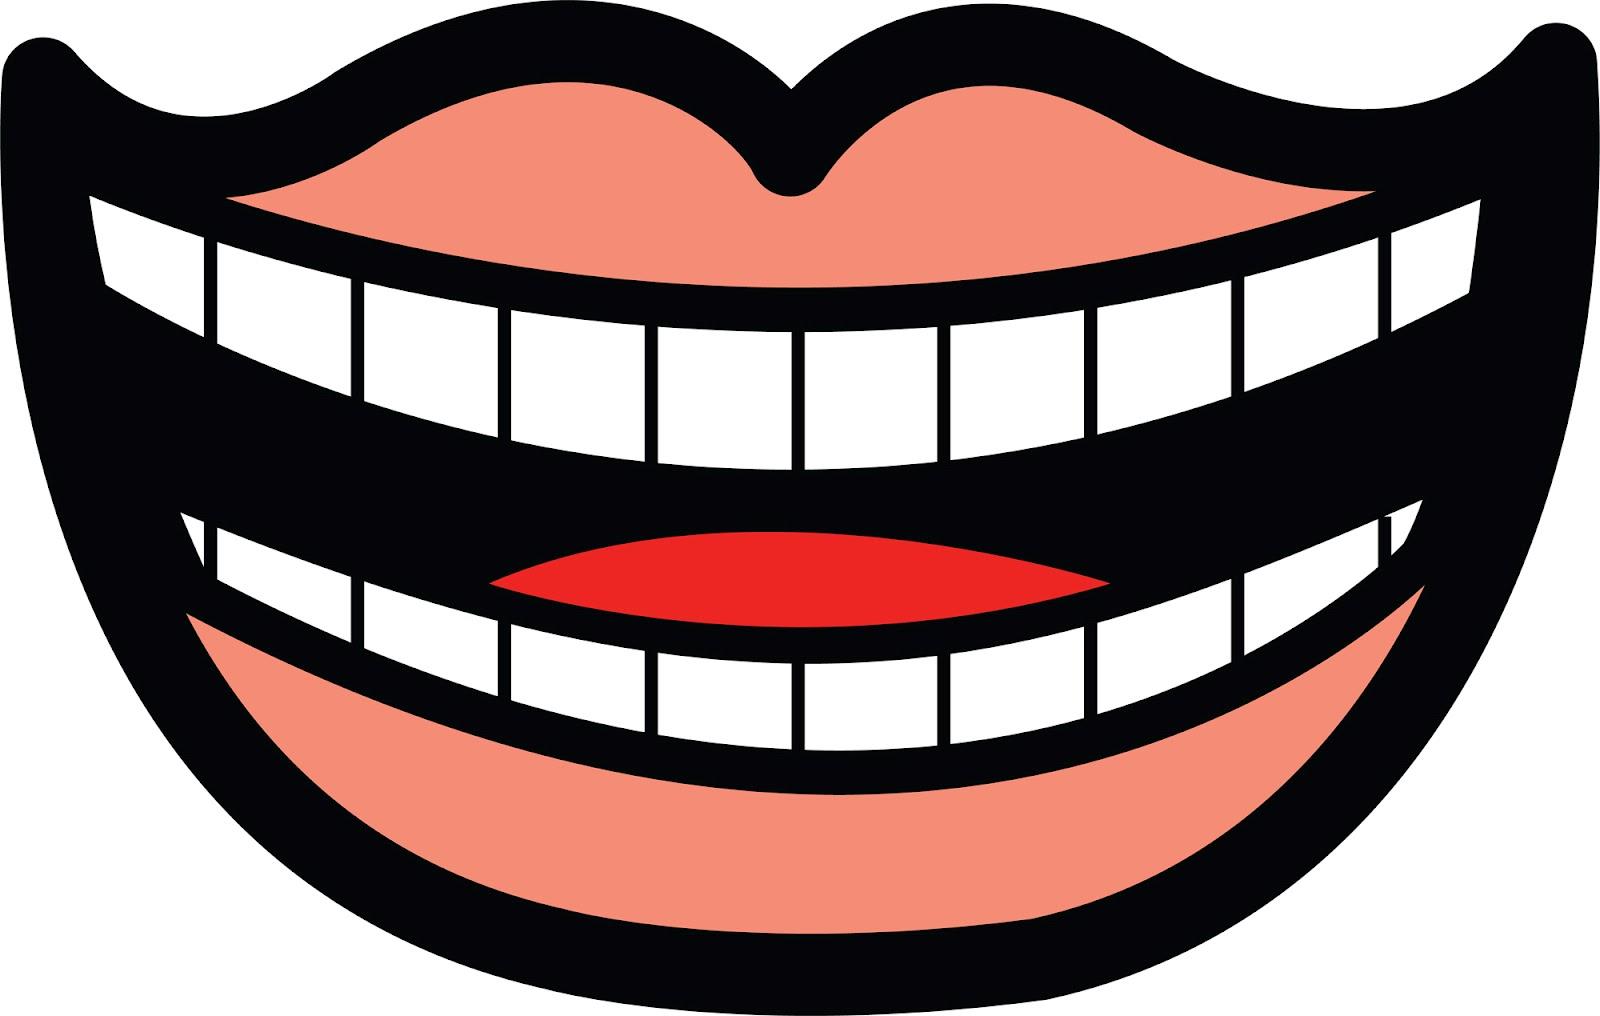 Quiet mouth clip art free clipart images 2